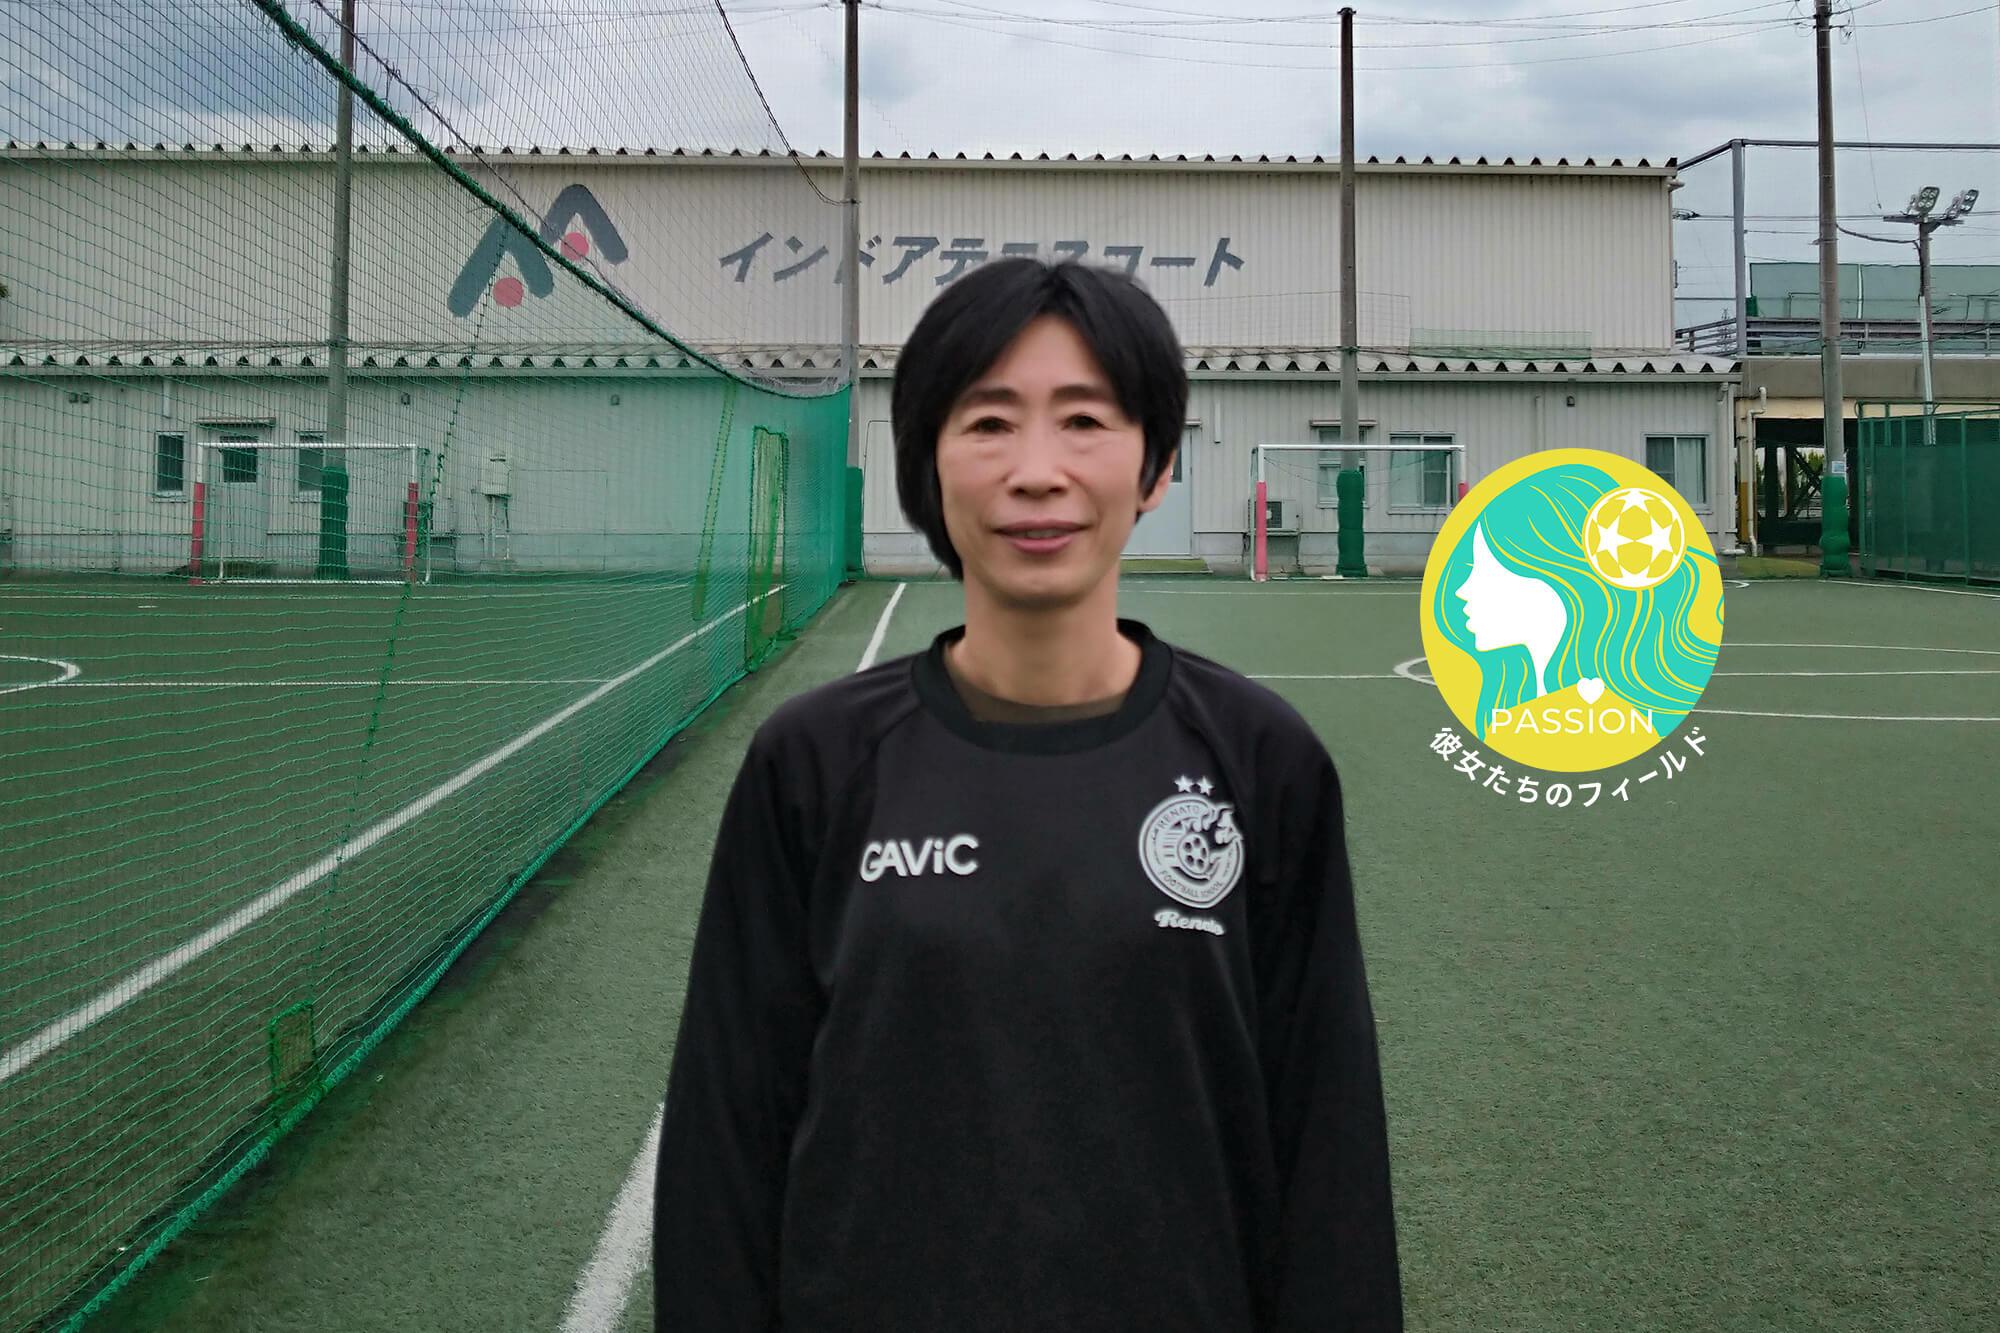 Vol.14 A&A西東京スポーツセンターレナト女子フットボールスクールコーチ/今井かおり